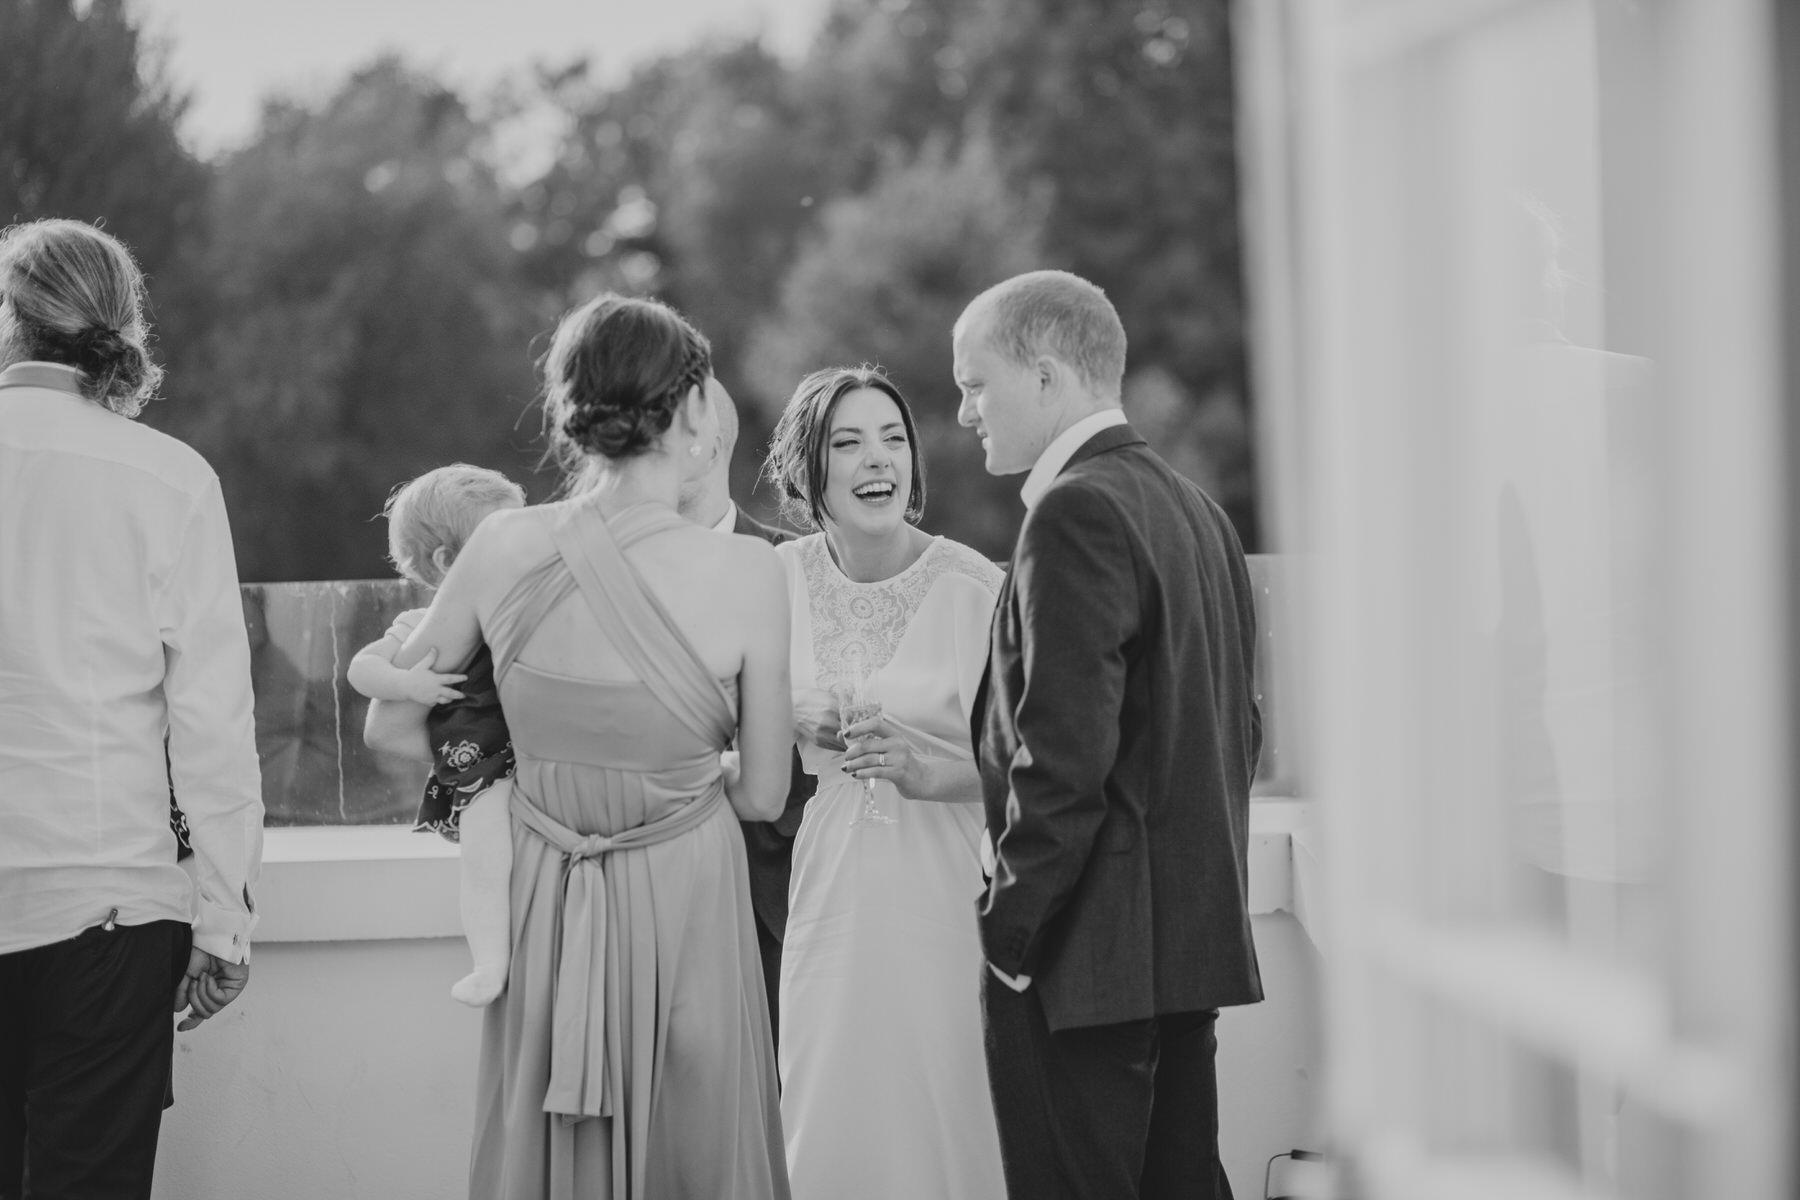 291 London reportage bride groom sunset drinks balcony.jpg